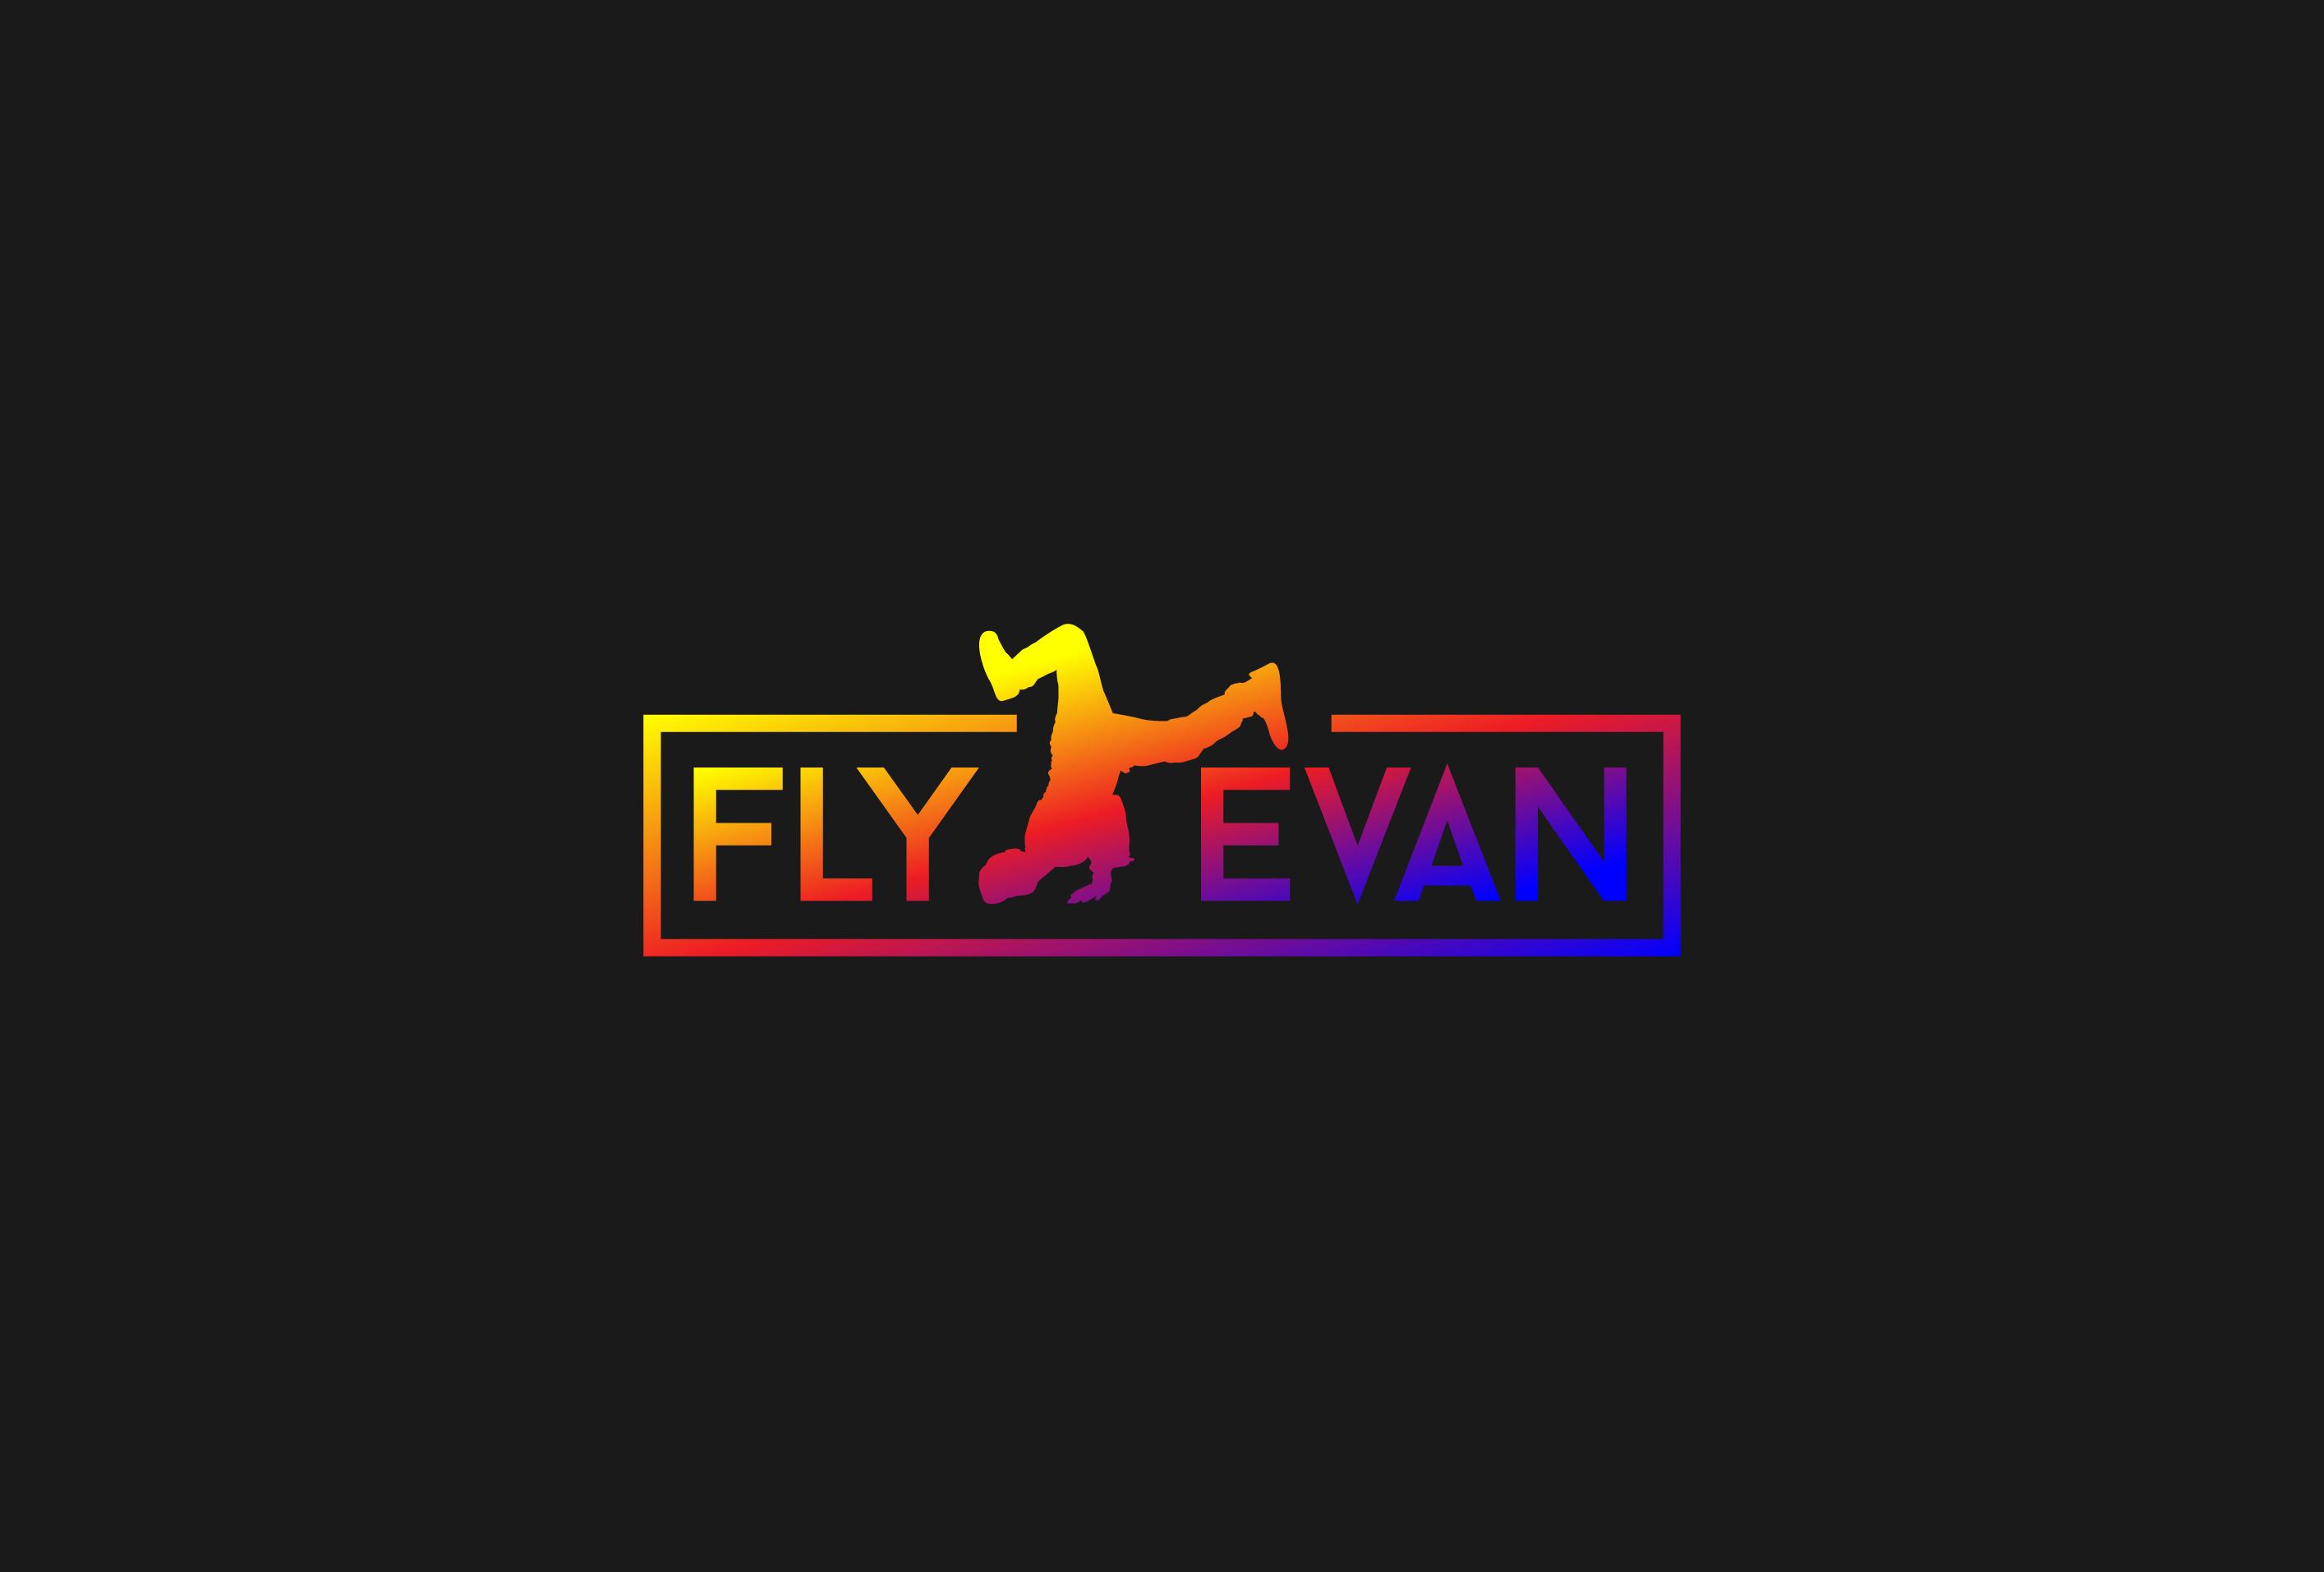 Fly Evan Logo #4